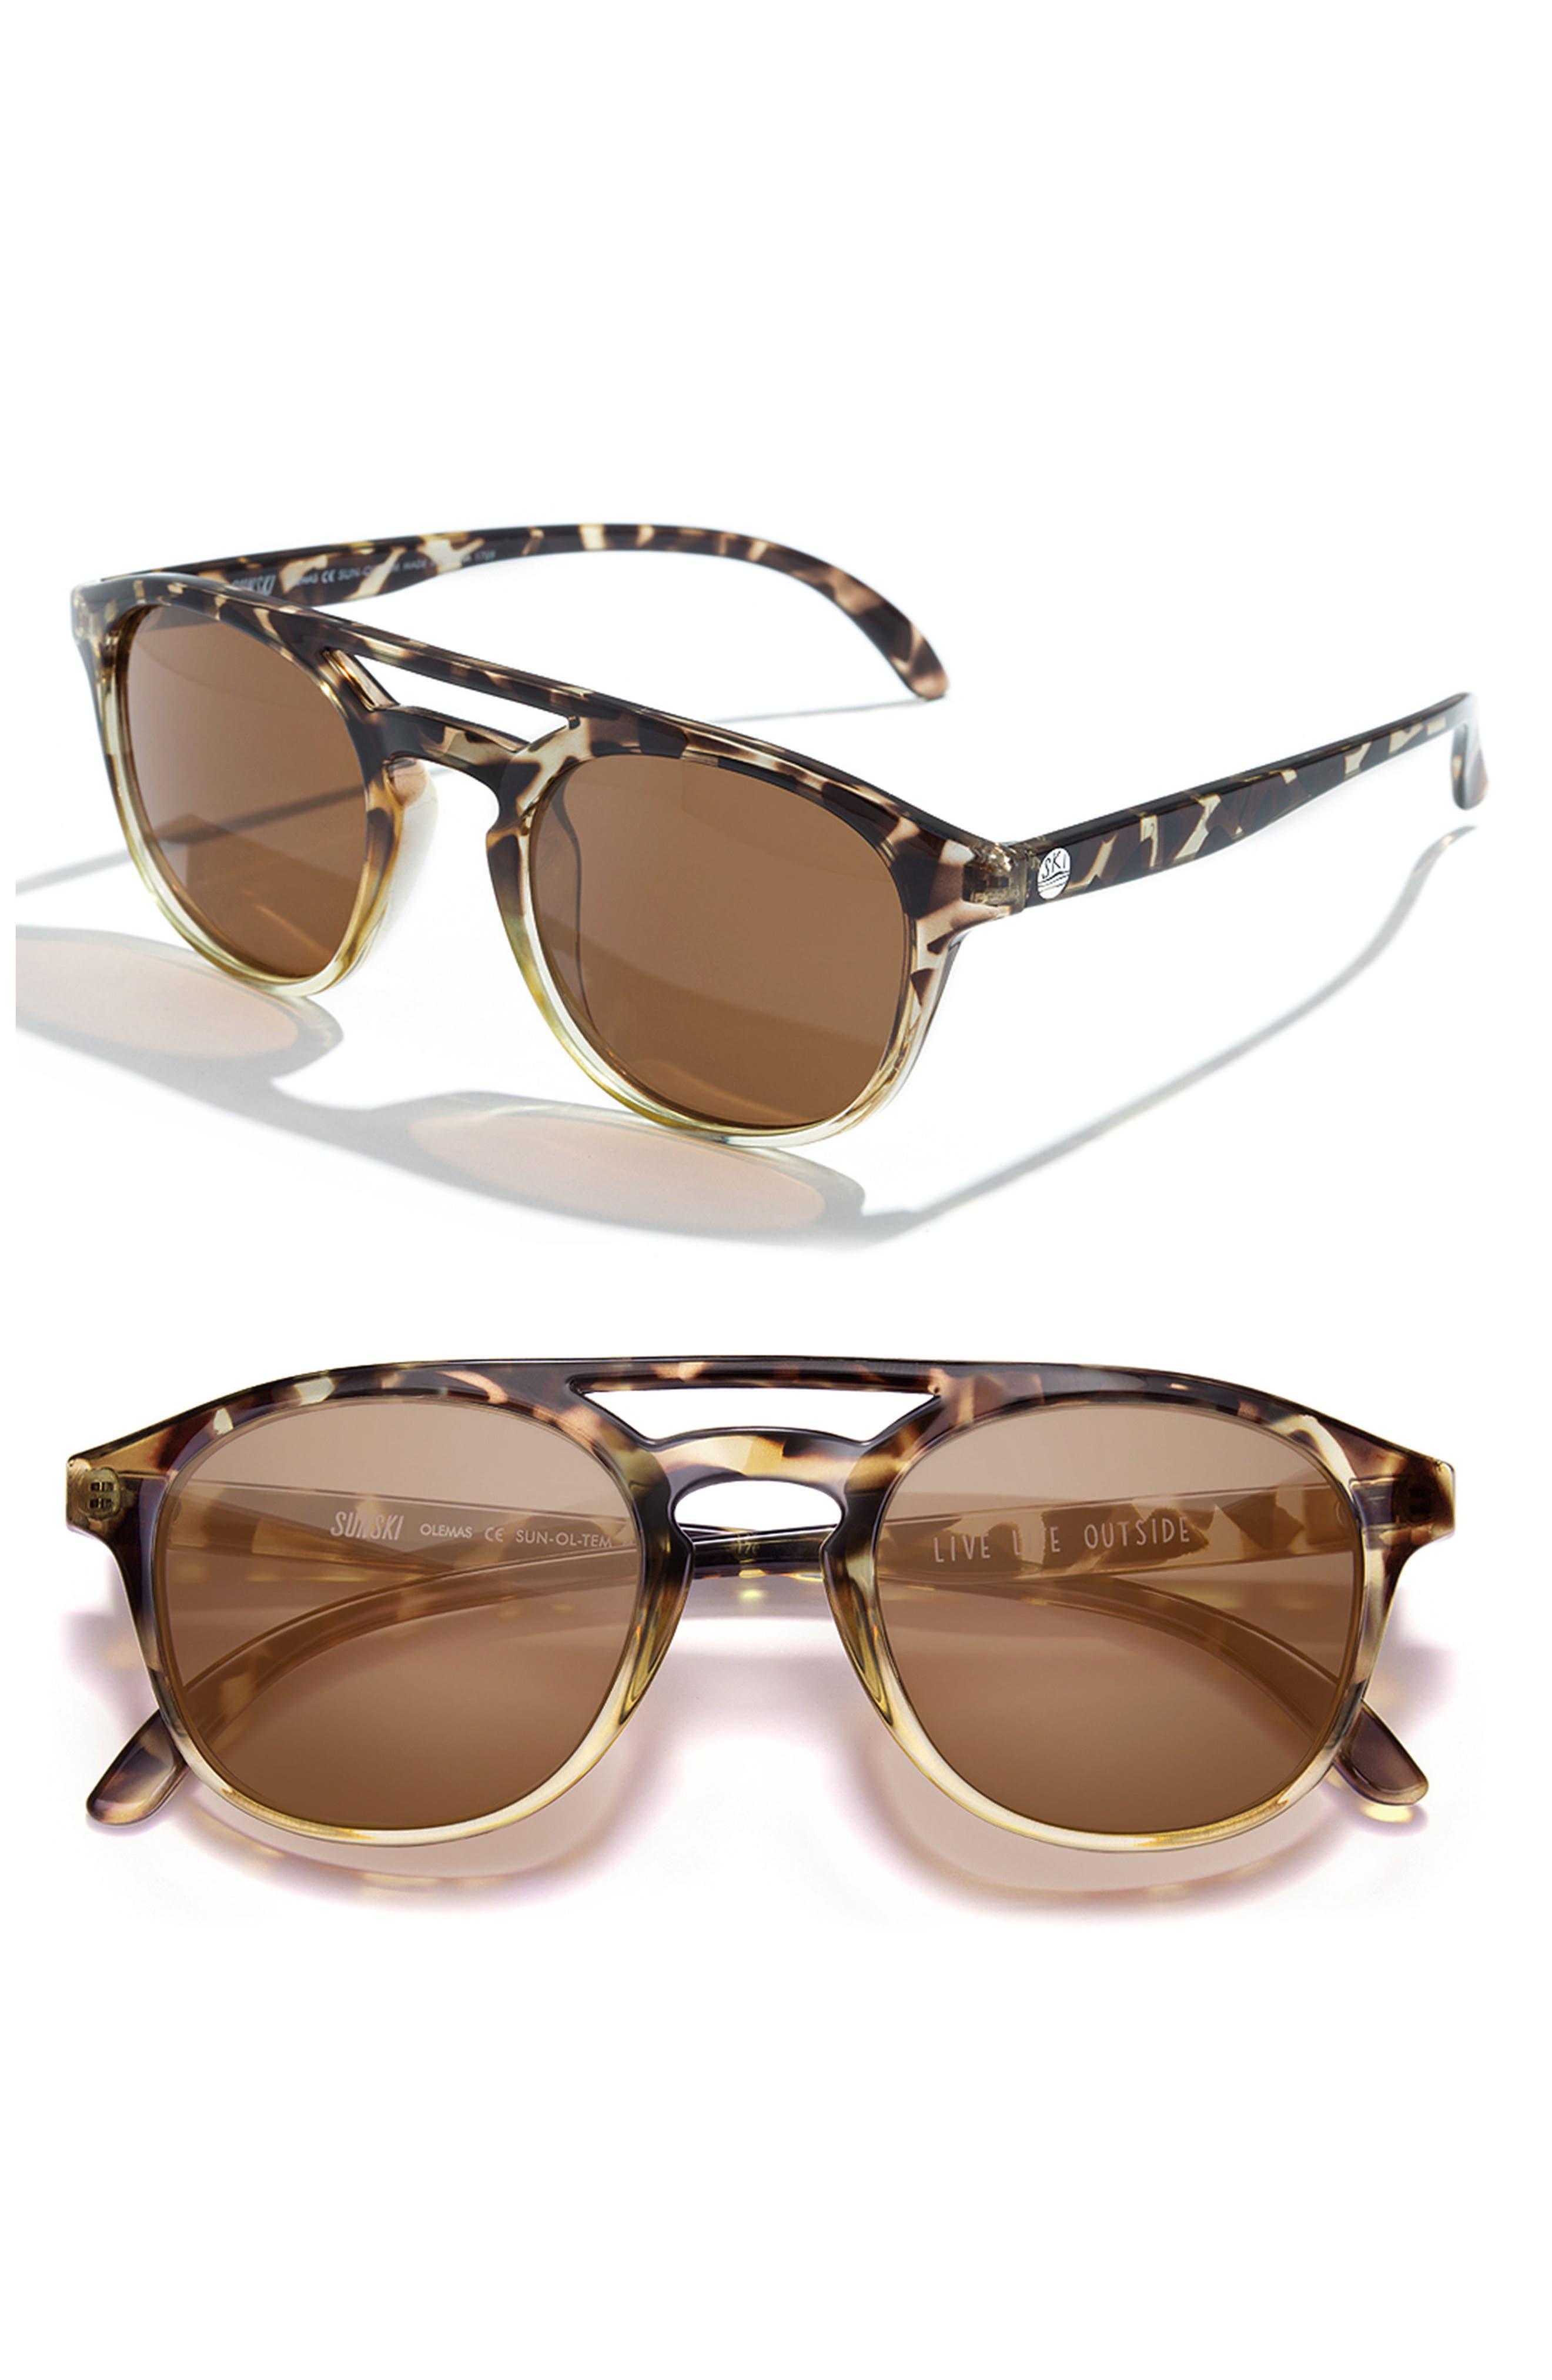 Sunski Olema 5m Polarized Sunglasses - Tortoise Amber